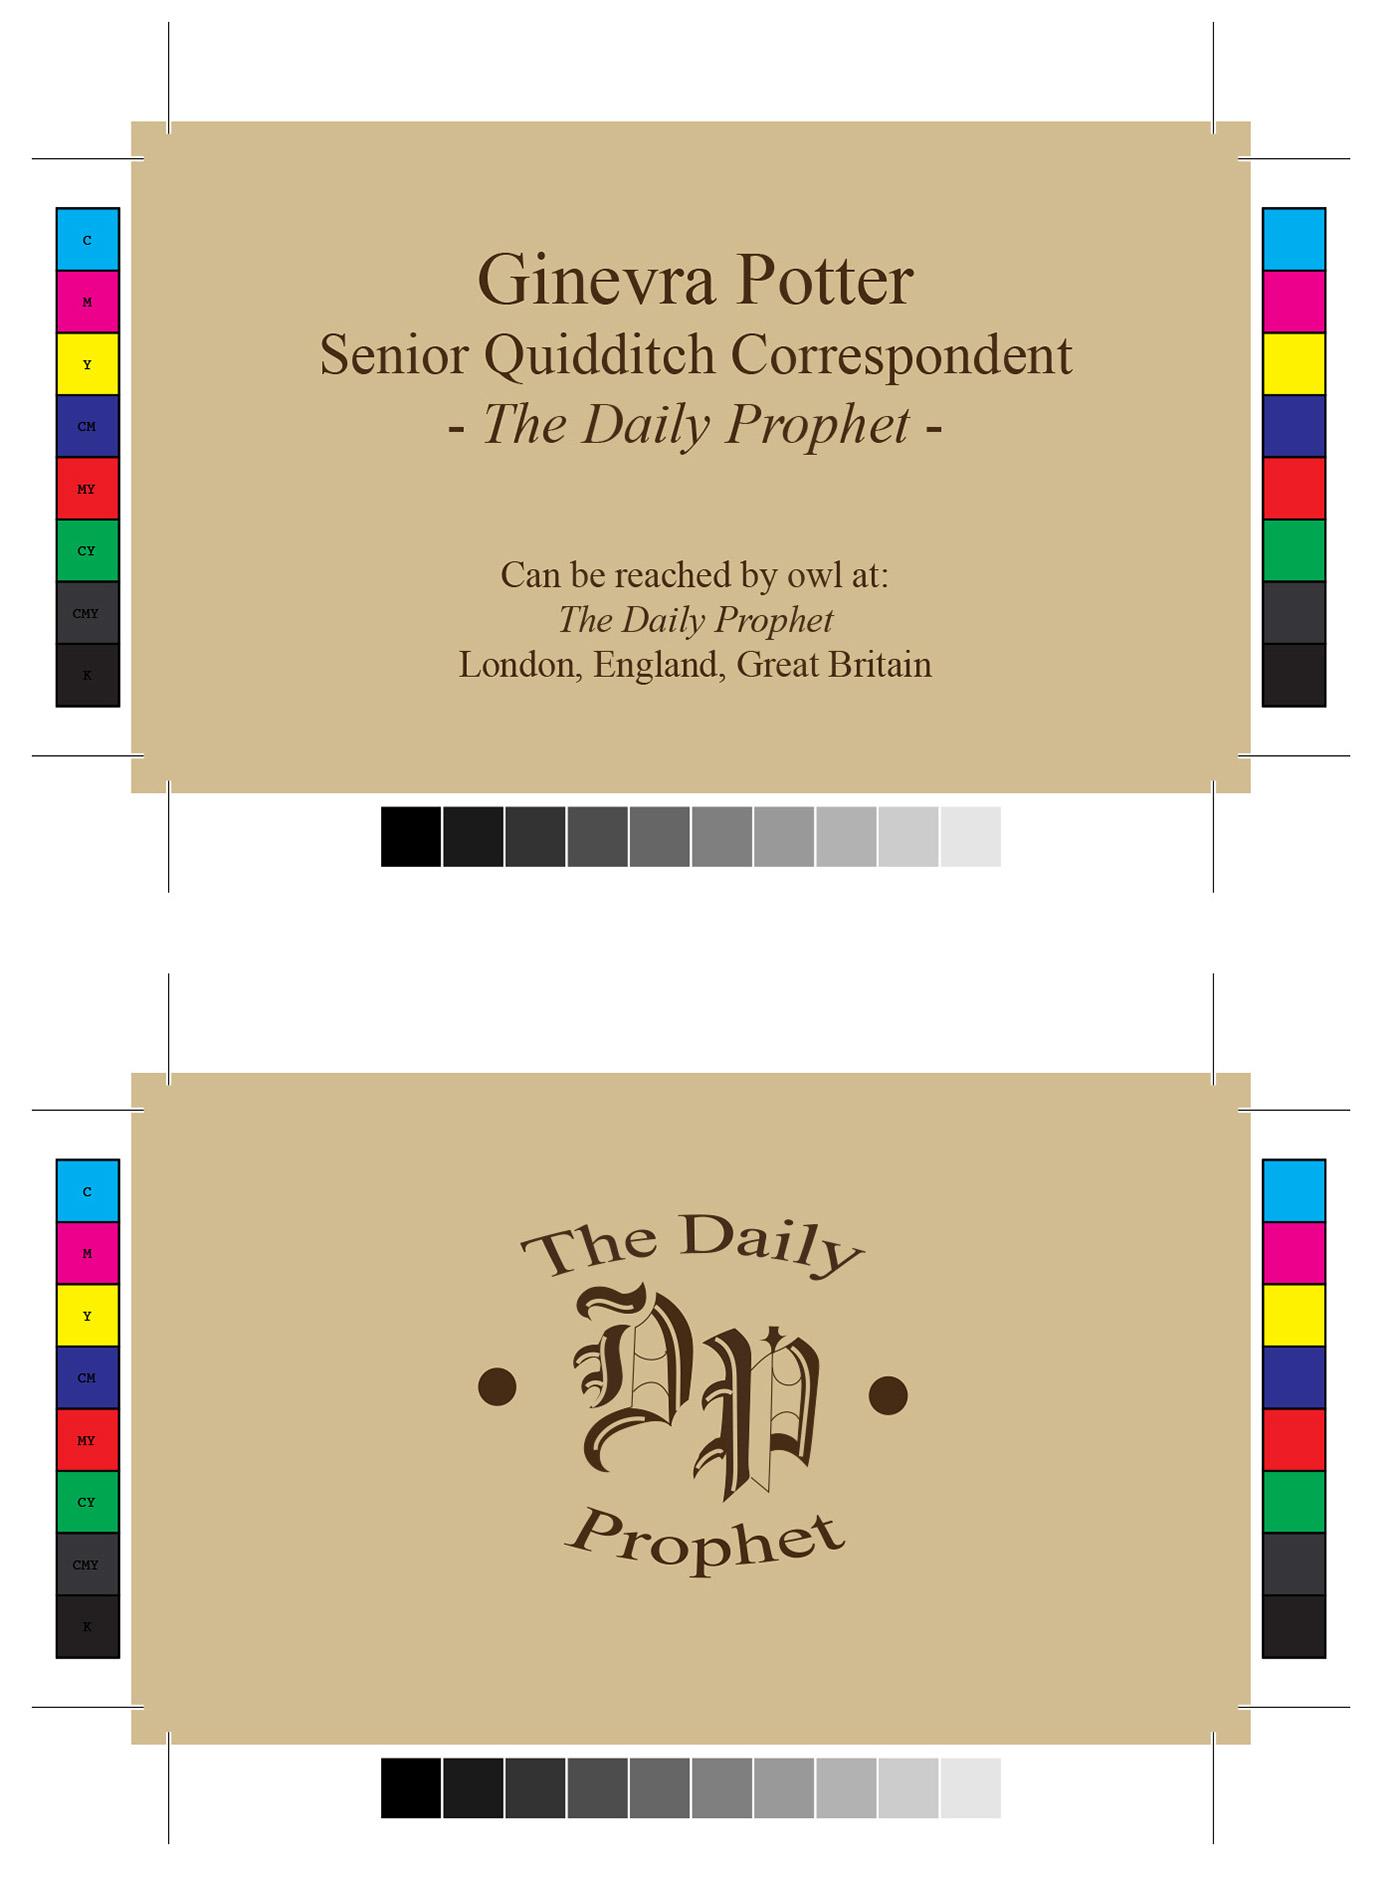 Harry Potter Business Card Designs On Behance